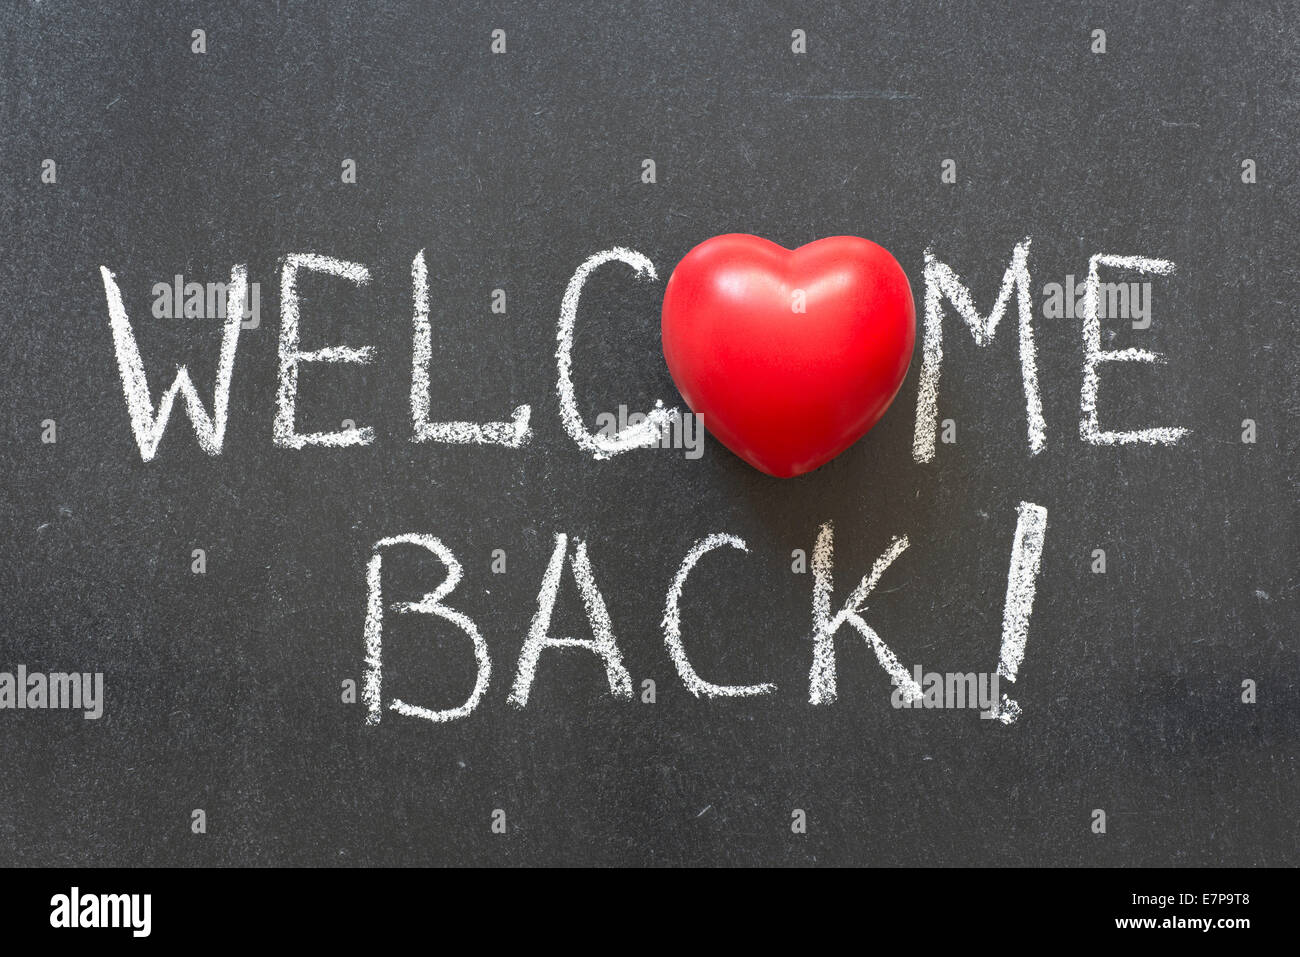 Welcome Back Phrase Handwritten On Chalkboard With Heart Symbol